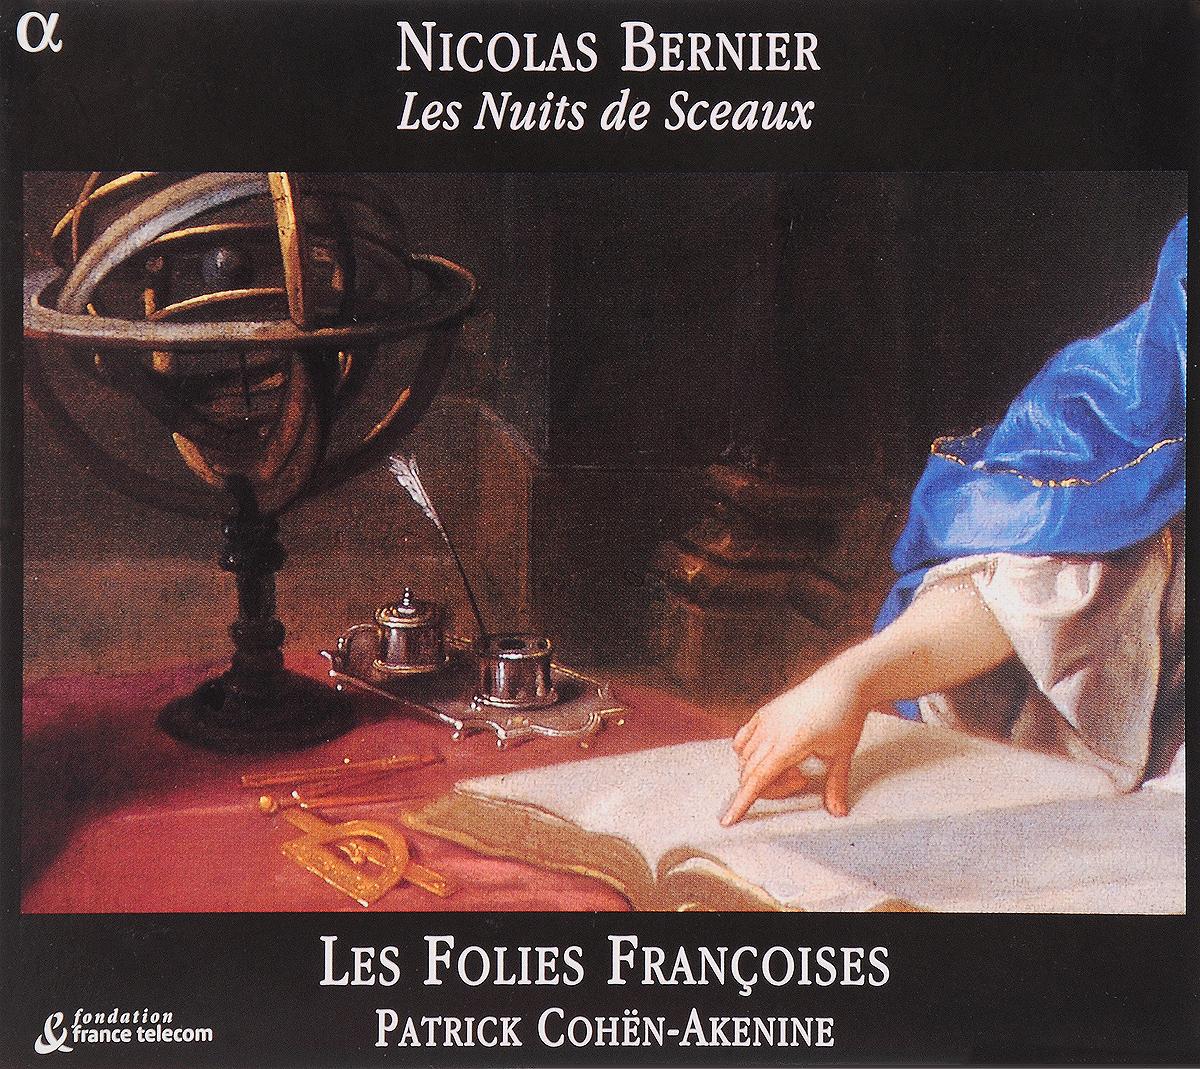 Исполнитель: VARIOUSАльбом: BERNIER, NICOLAS (1664-1734)/LES NUITS DE SCEAUX: CANTATES/LES FOLIES FRANCOISES/PATRICK COHEN-AKENINEПроизводитель: ALPHA